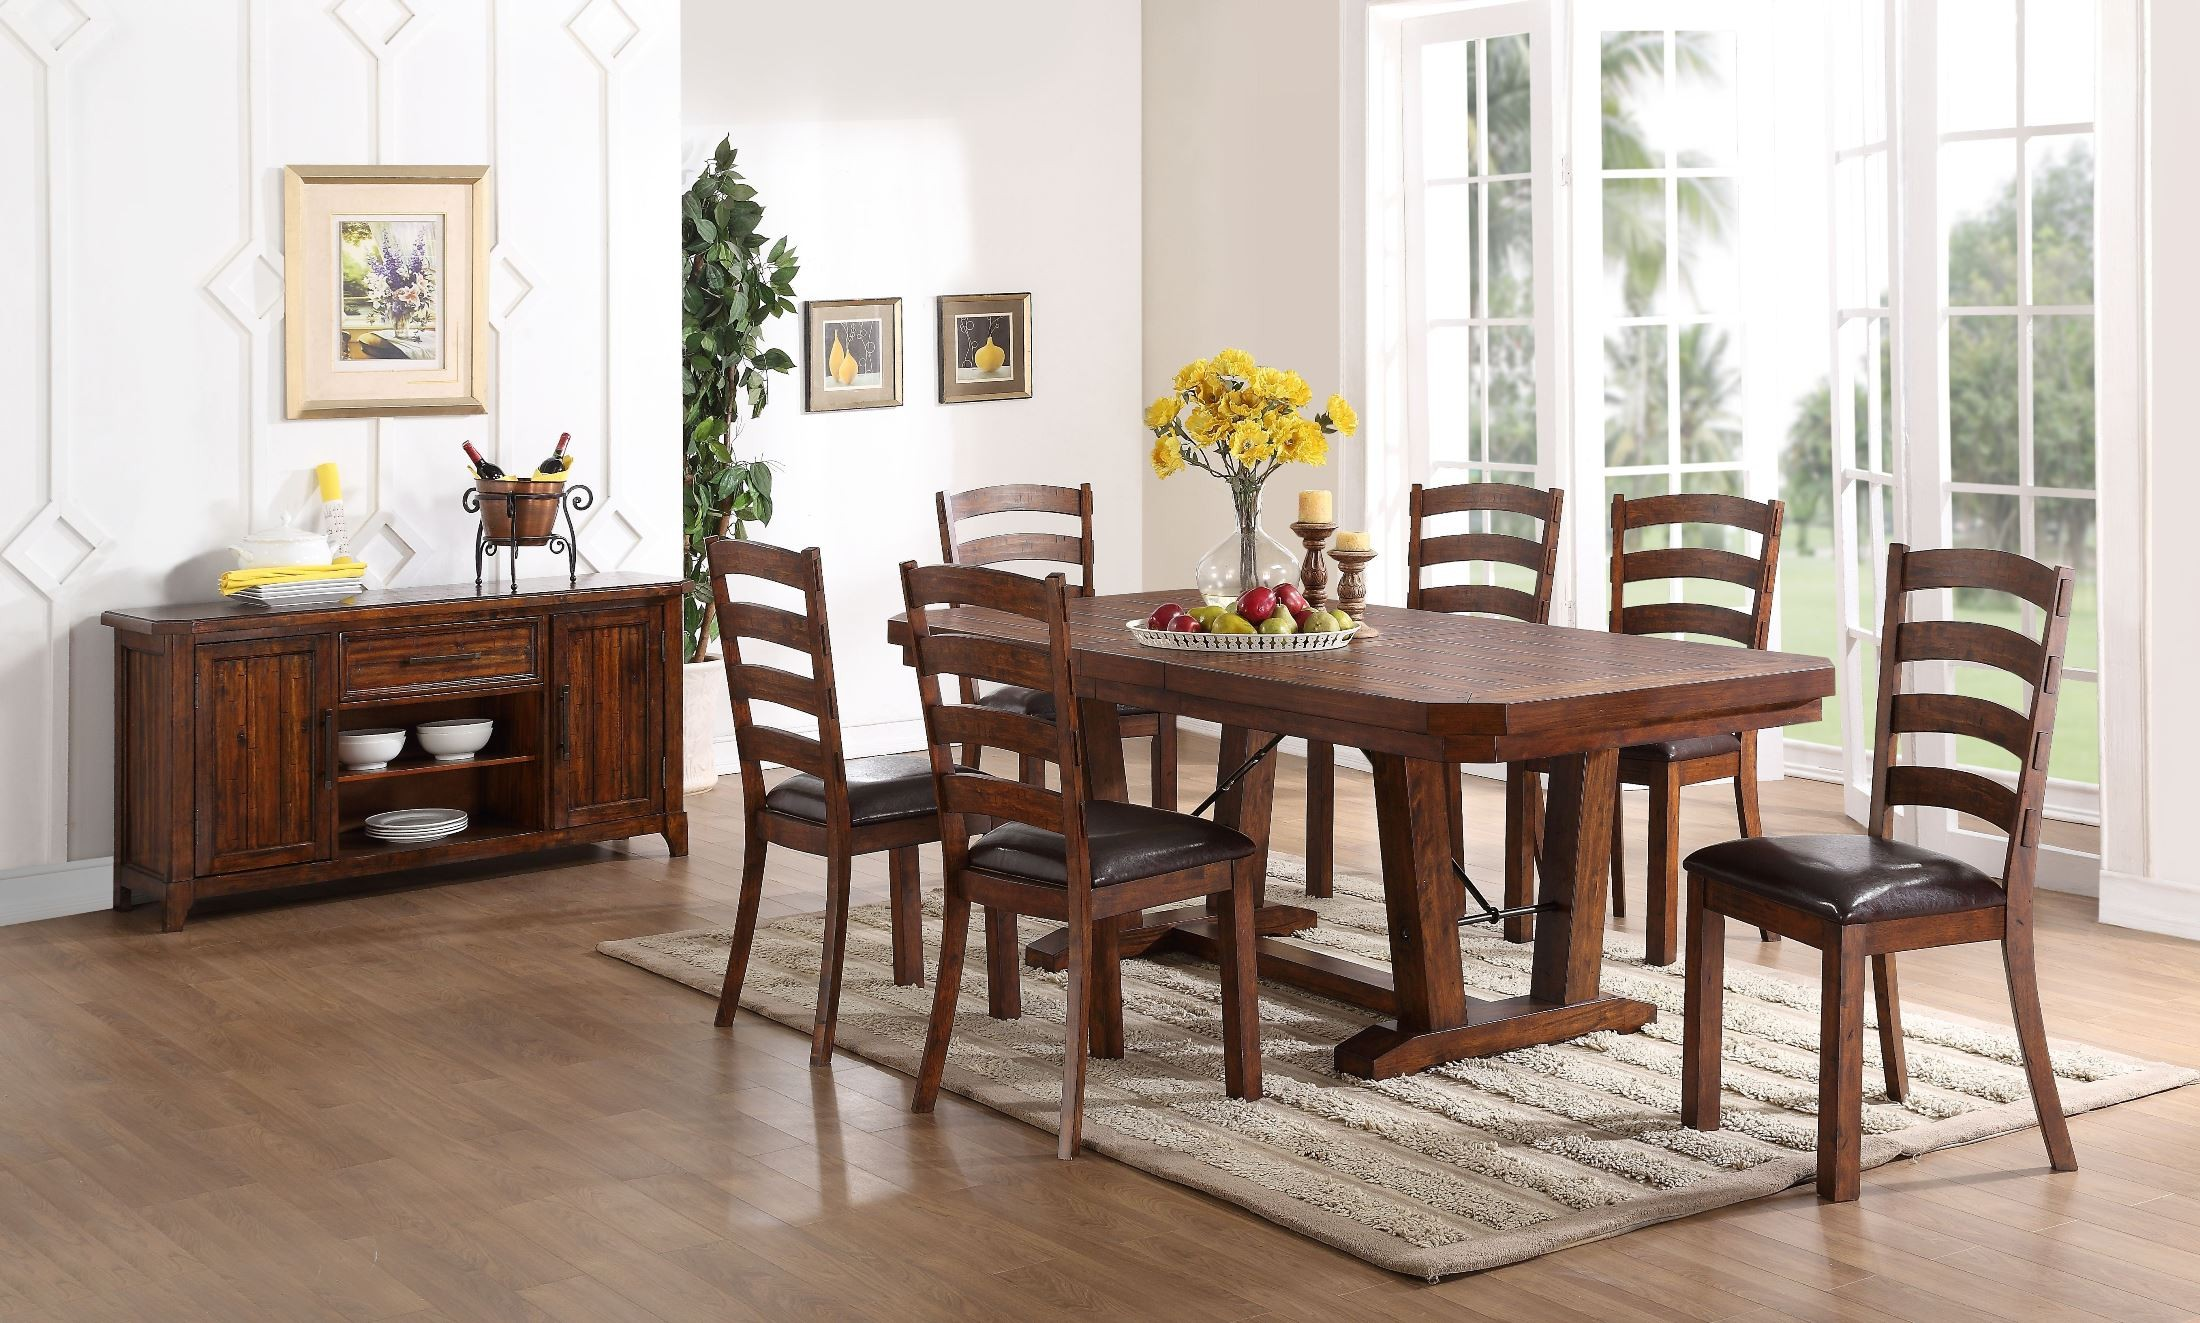 lanesboro distressed walnut dining room set from new